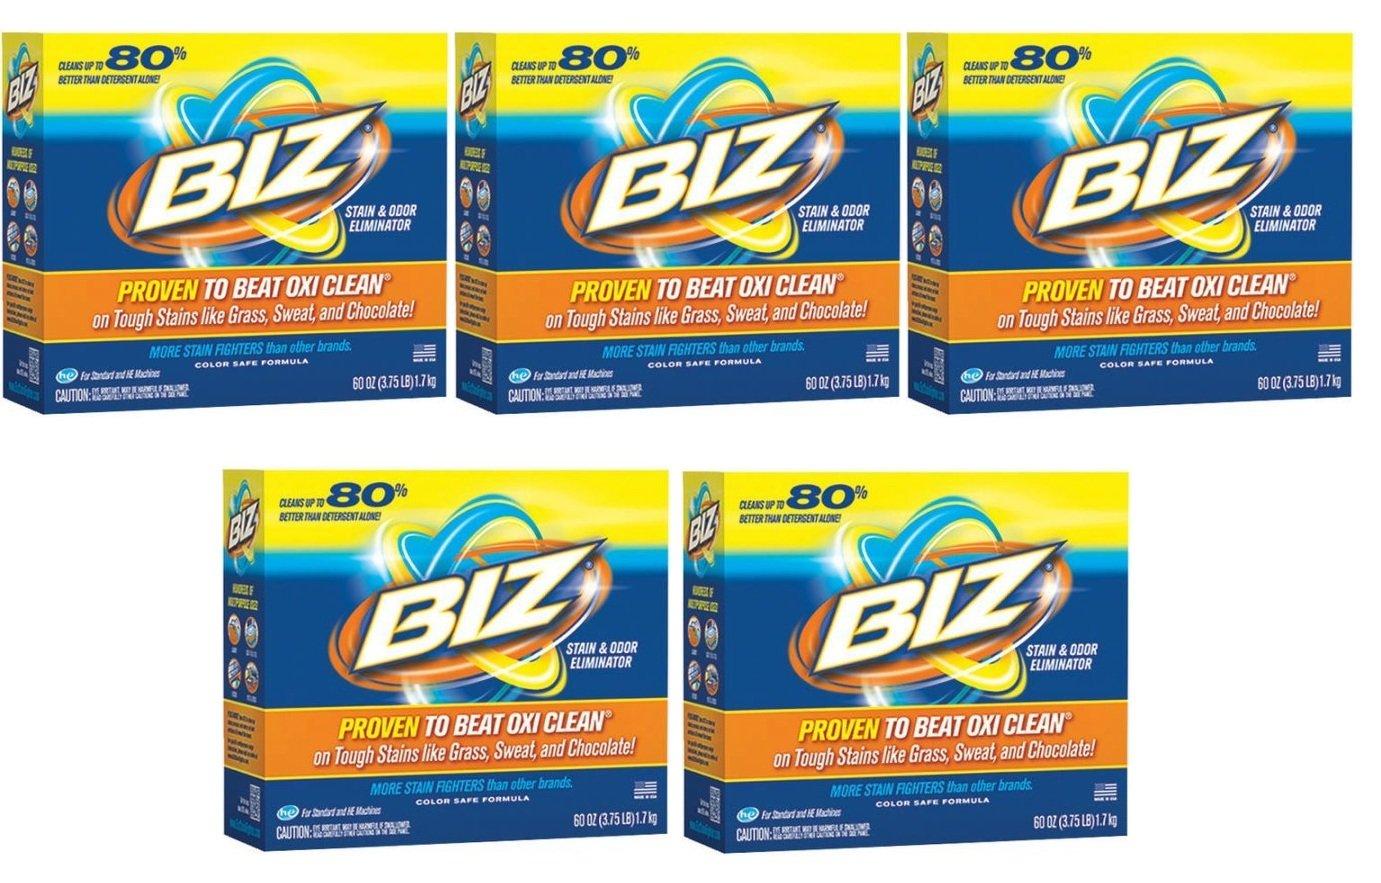 Biz Stain & Odor Eliminator Powder, 60 oz (5pack)